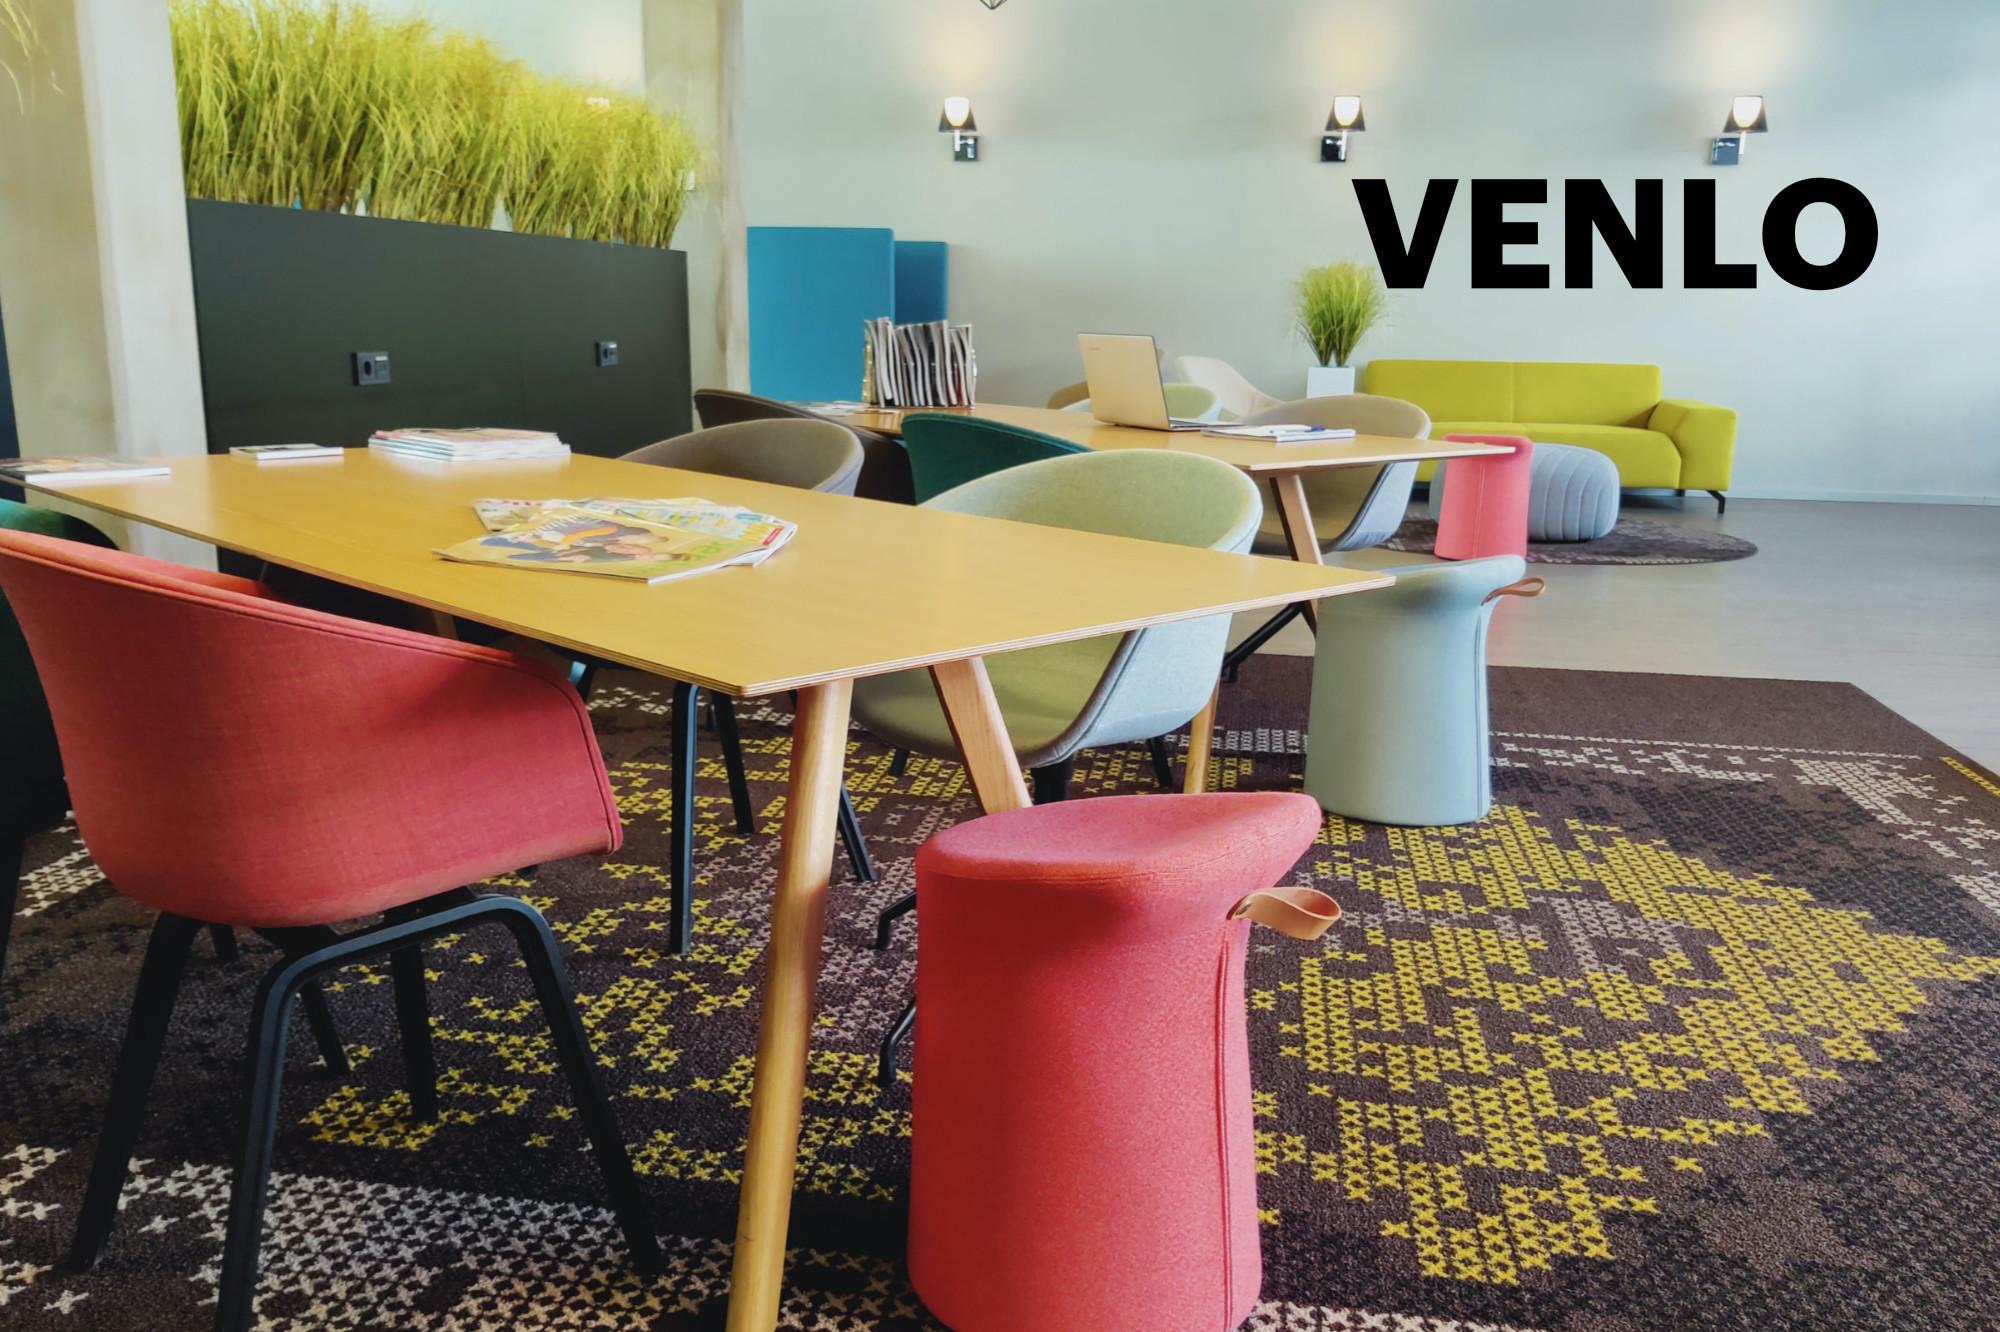 Branch Office Venlo - Contact us